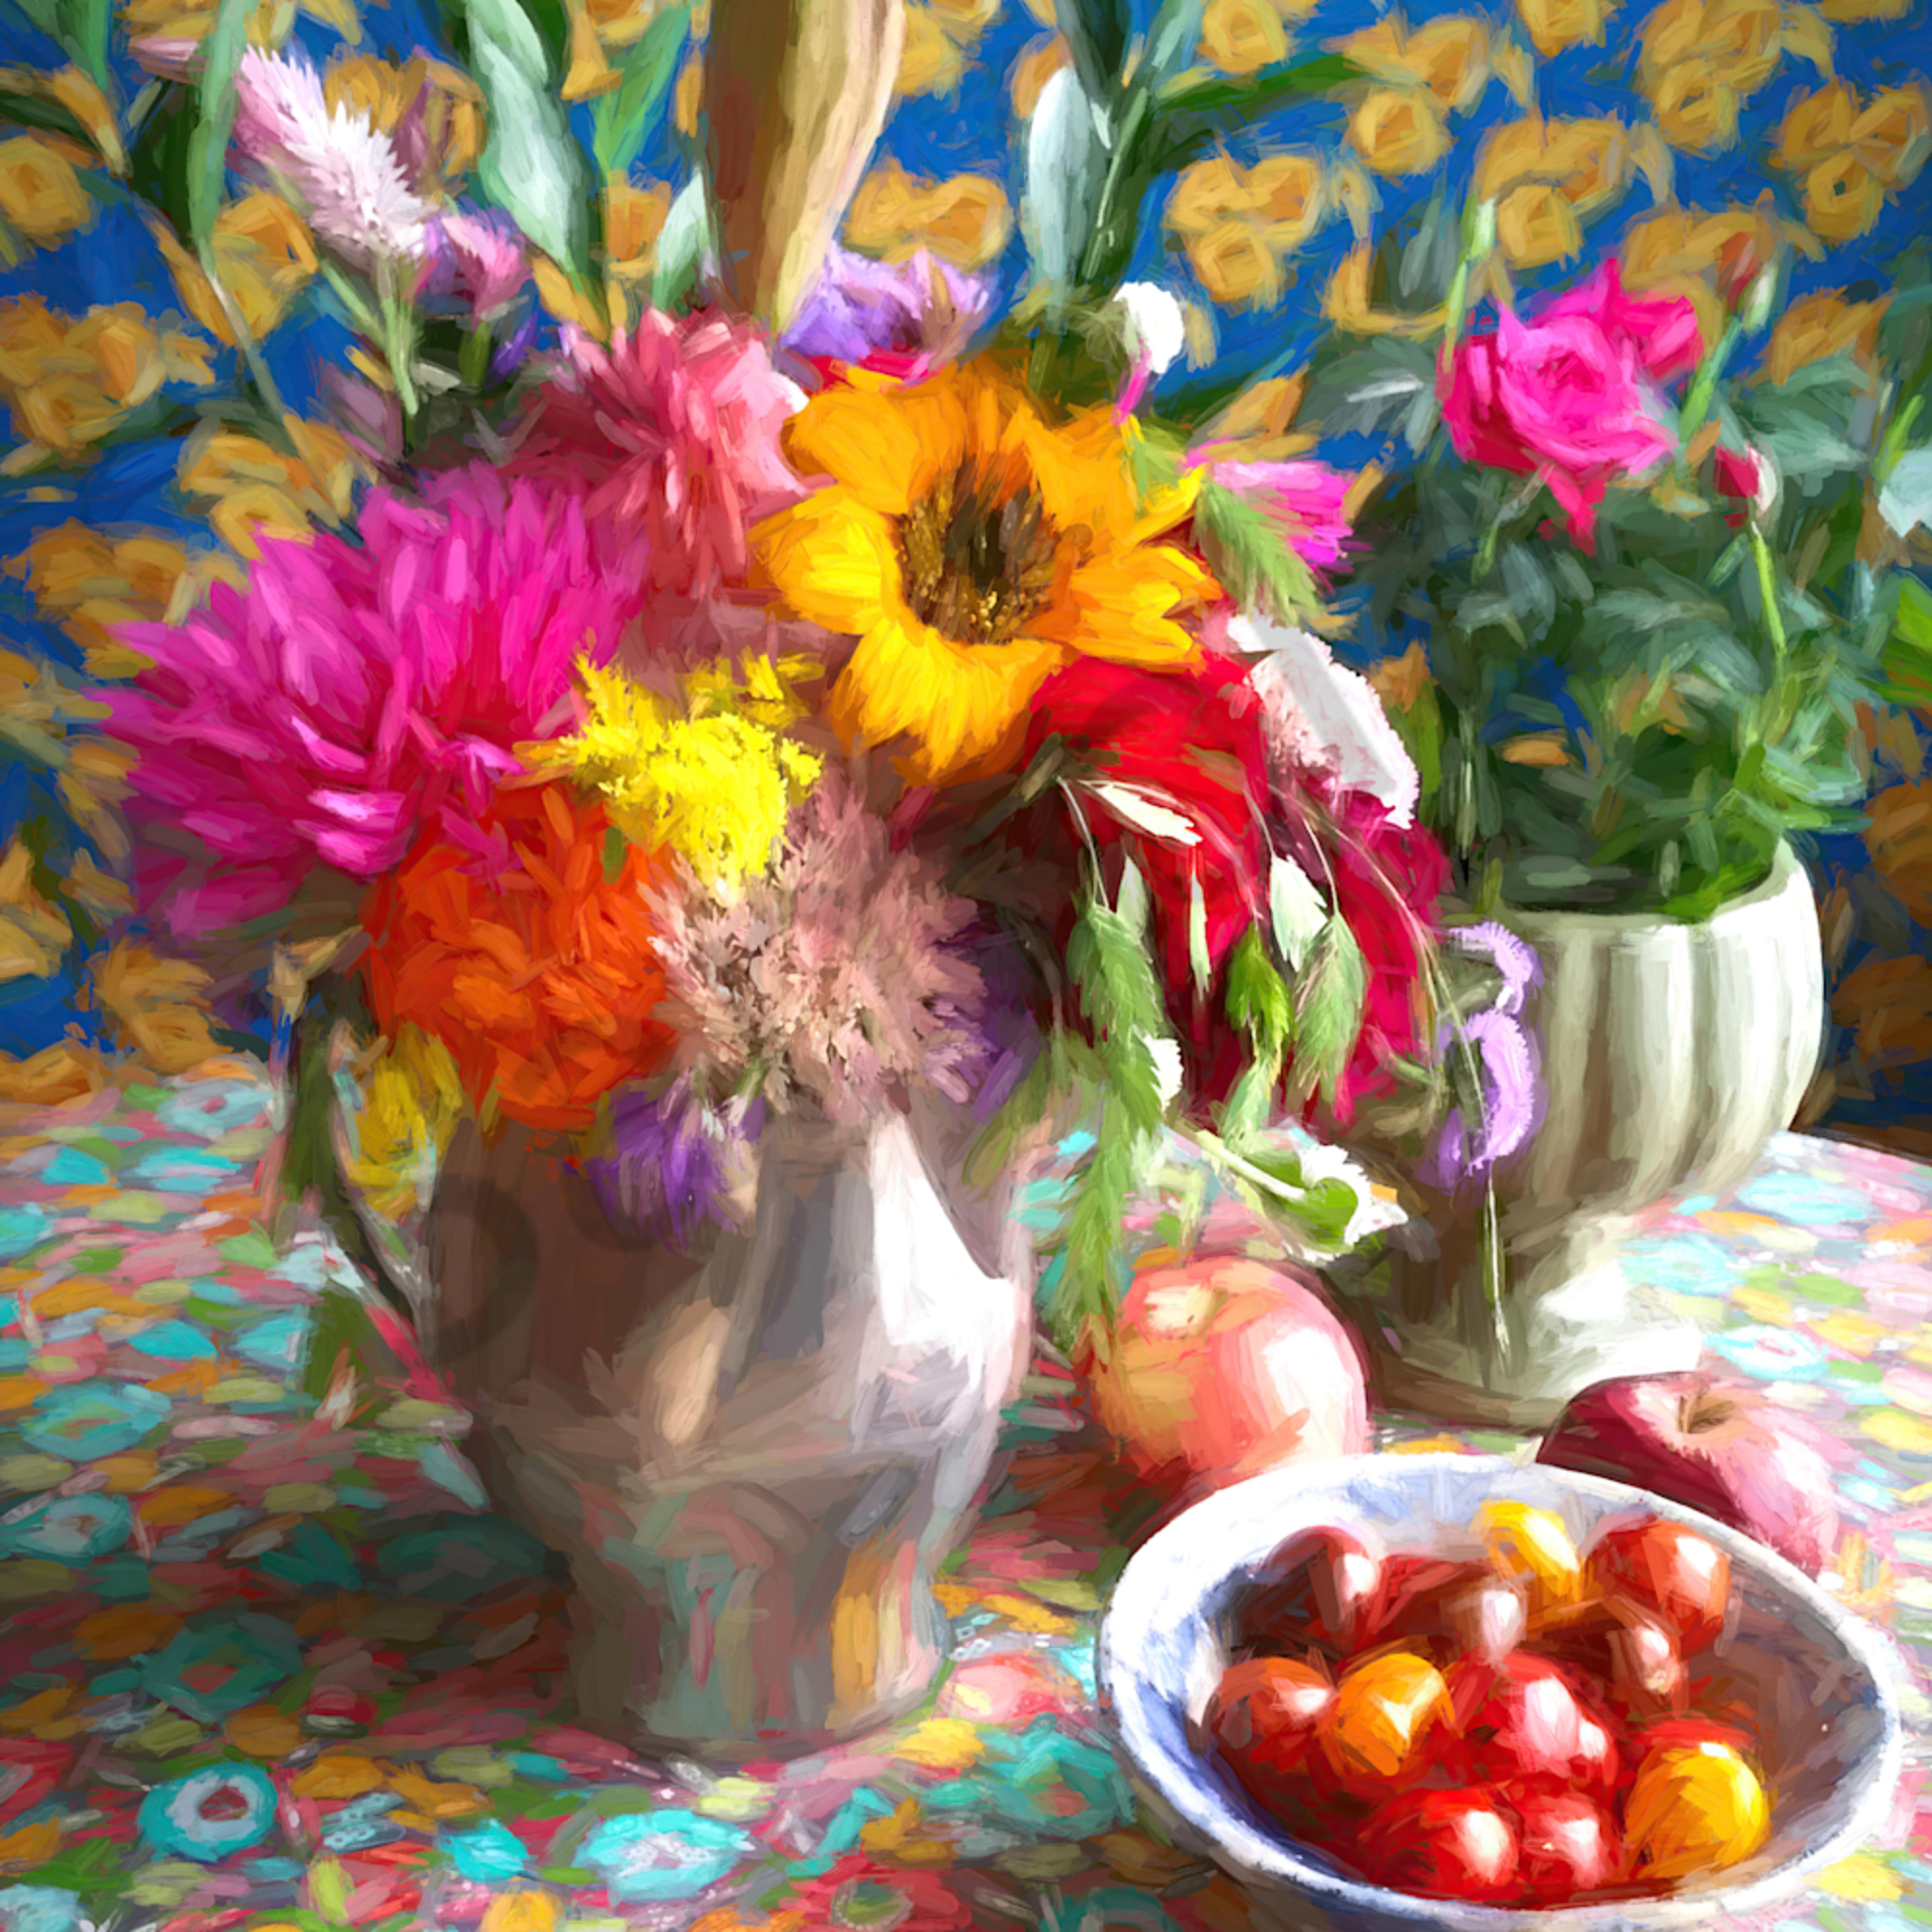 20190916 181728 inna dzhanibekova still life with tomatoes website 03 gp eitajy